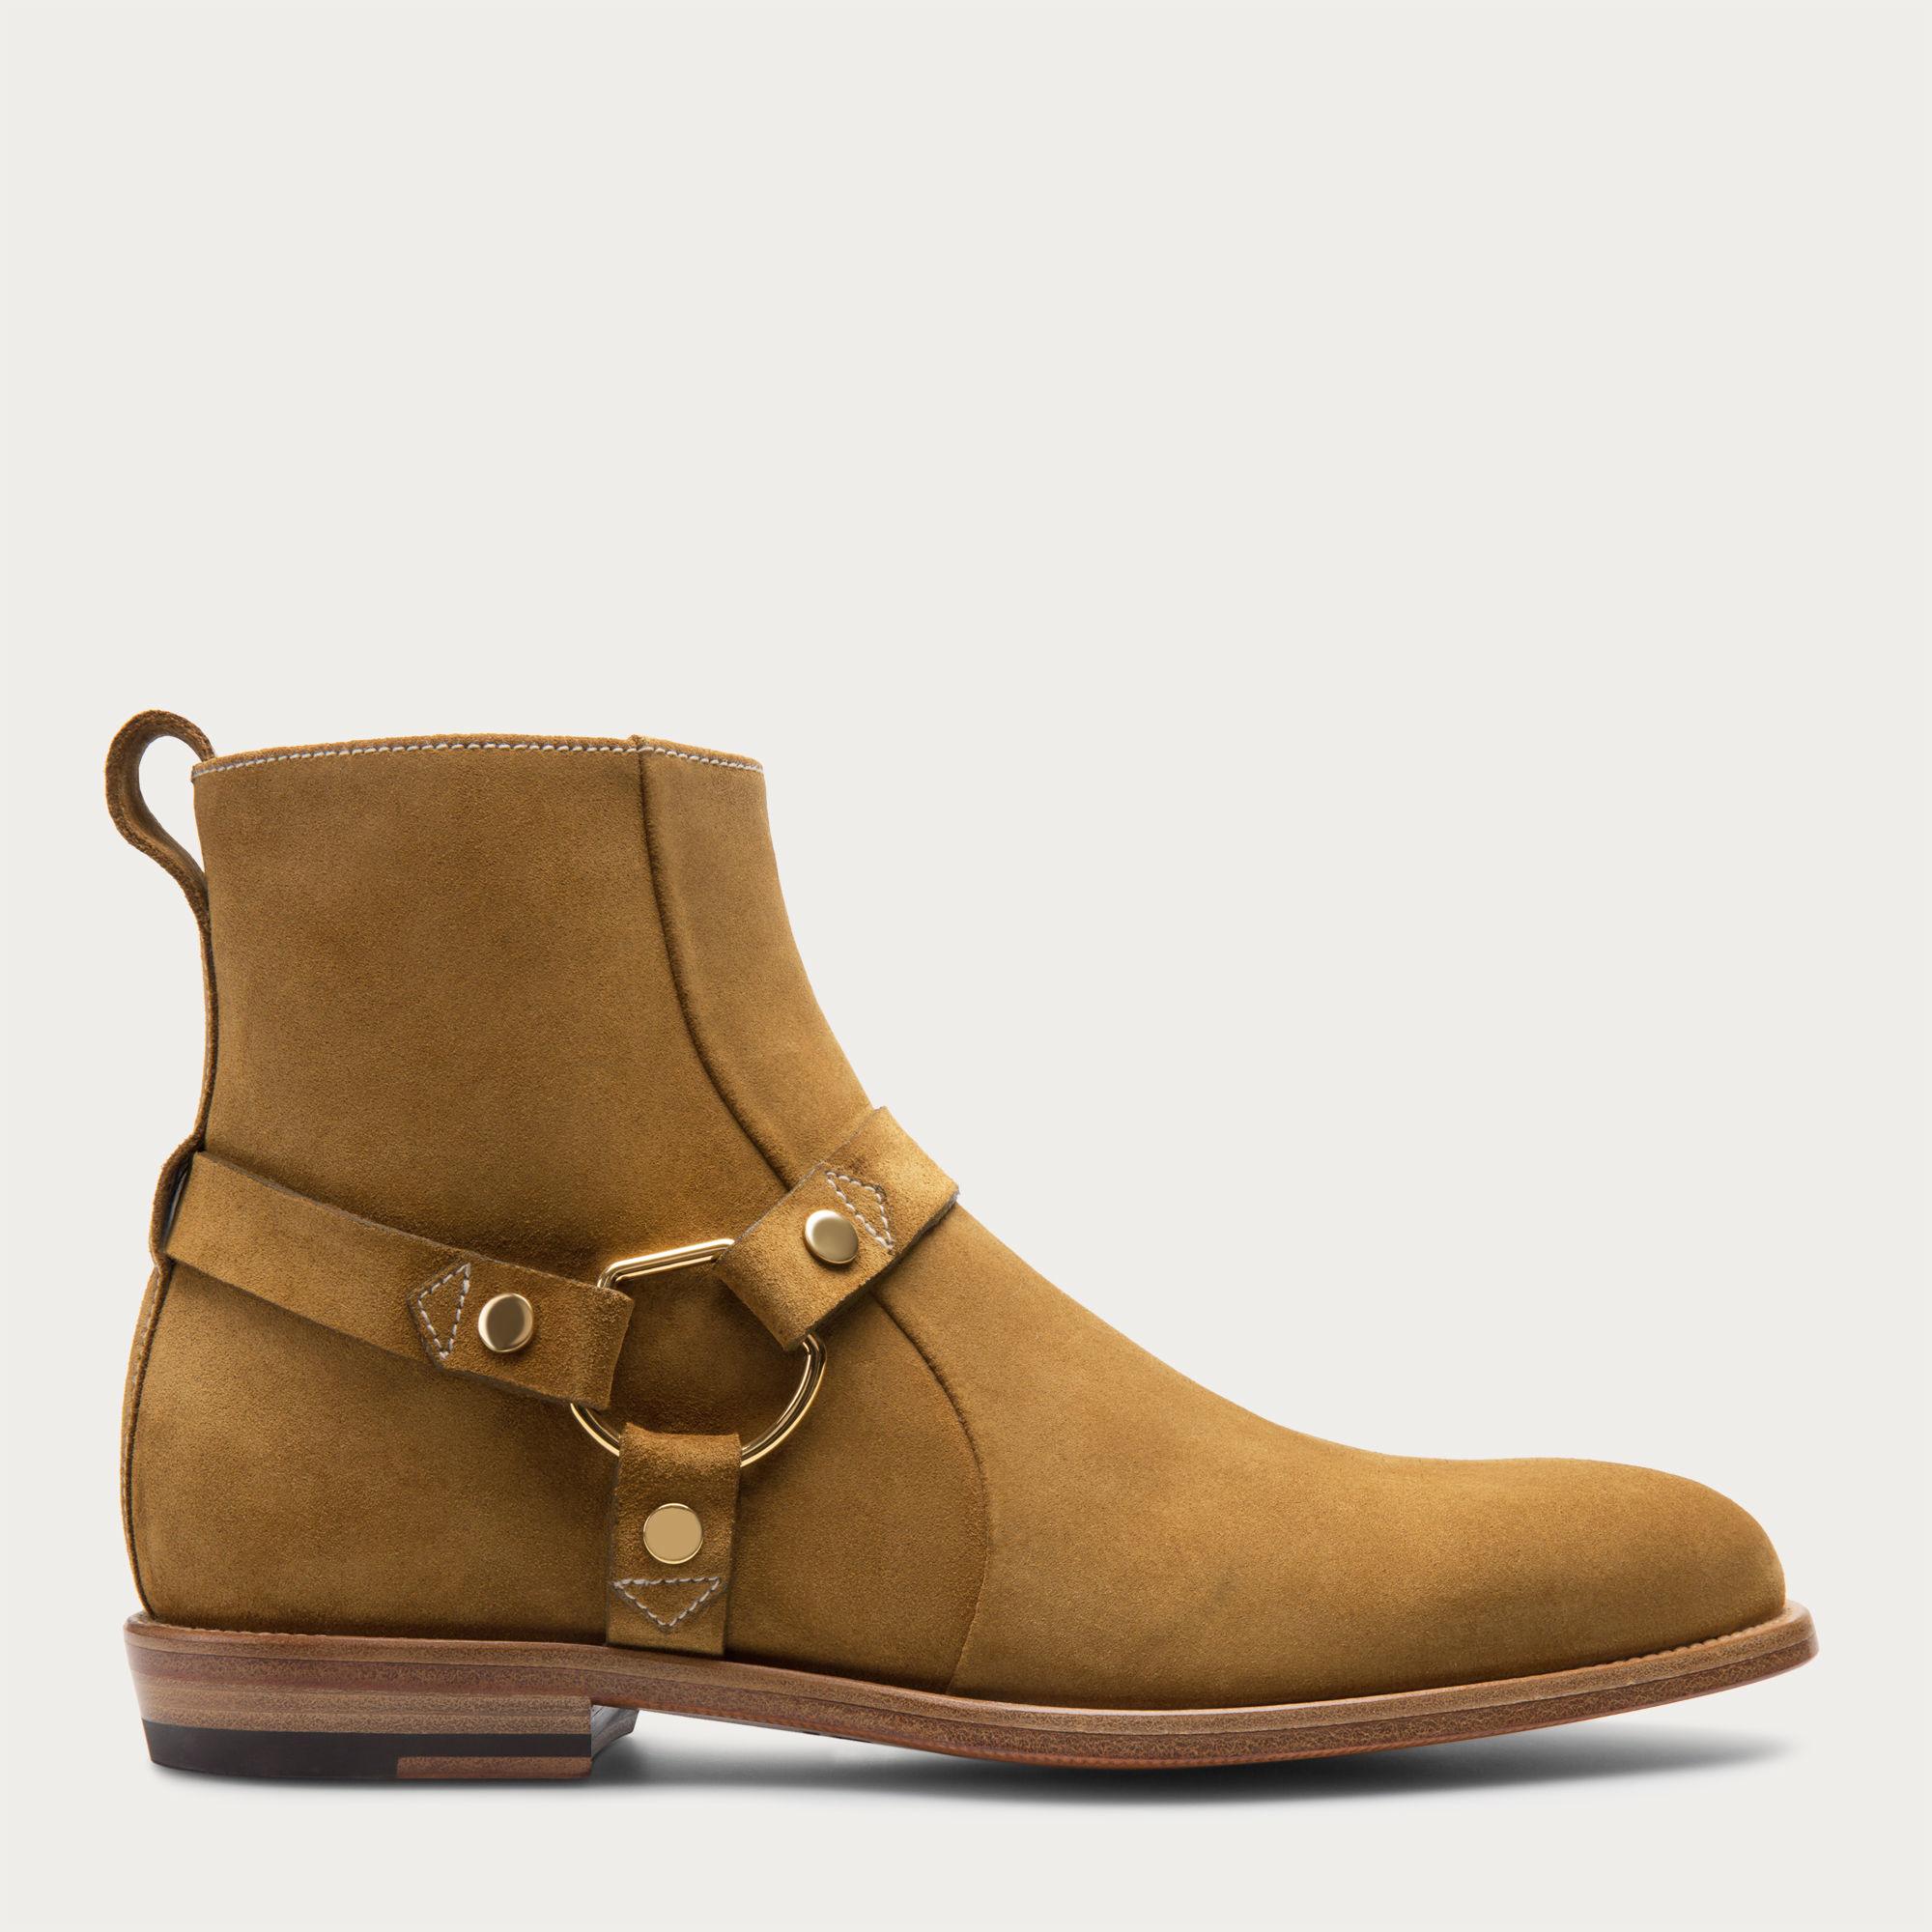 be5fe20c2d0ed Lyst - Bally Hofman Men s Suede Boot In Dark Peanut in Natural